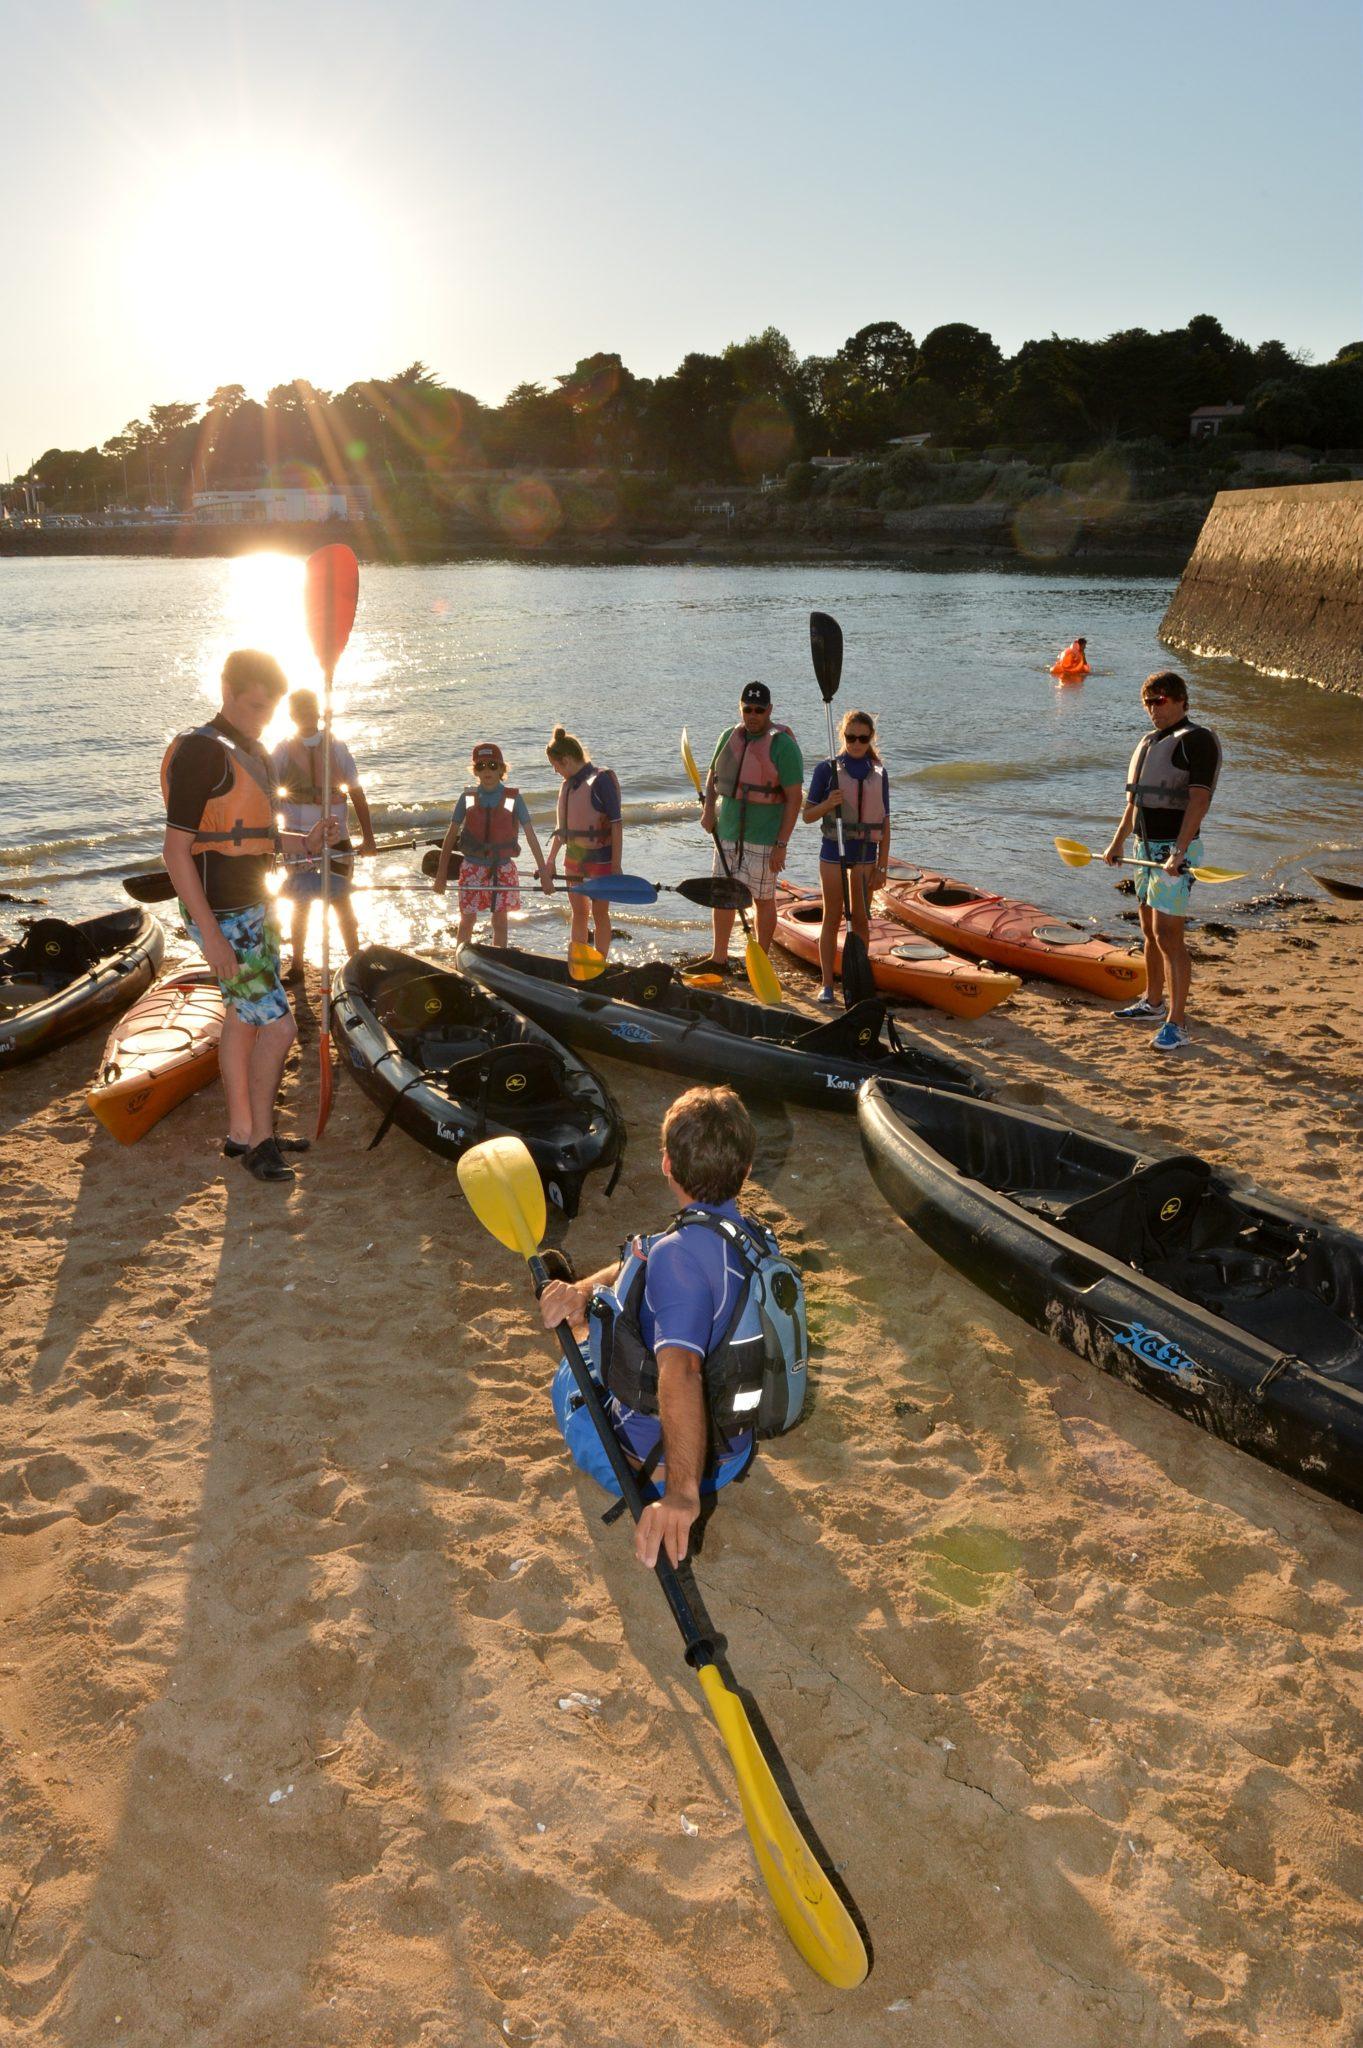 Kayak-de-mer-balade-au-coucher-du-soleil-Pornic-©-Ch.-Favreau